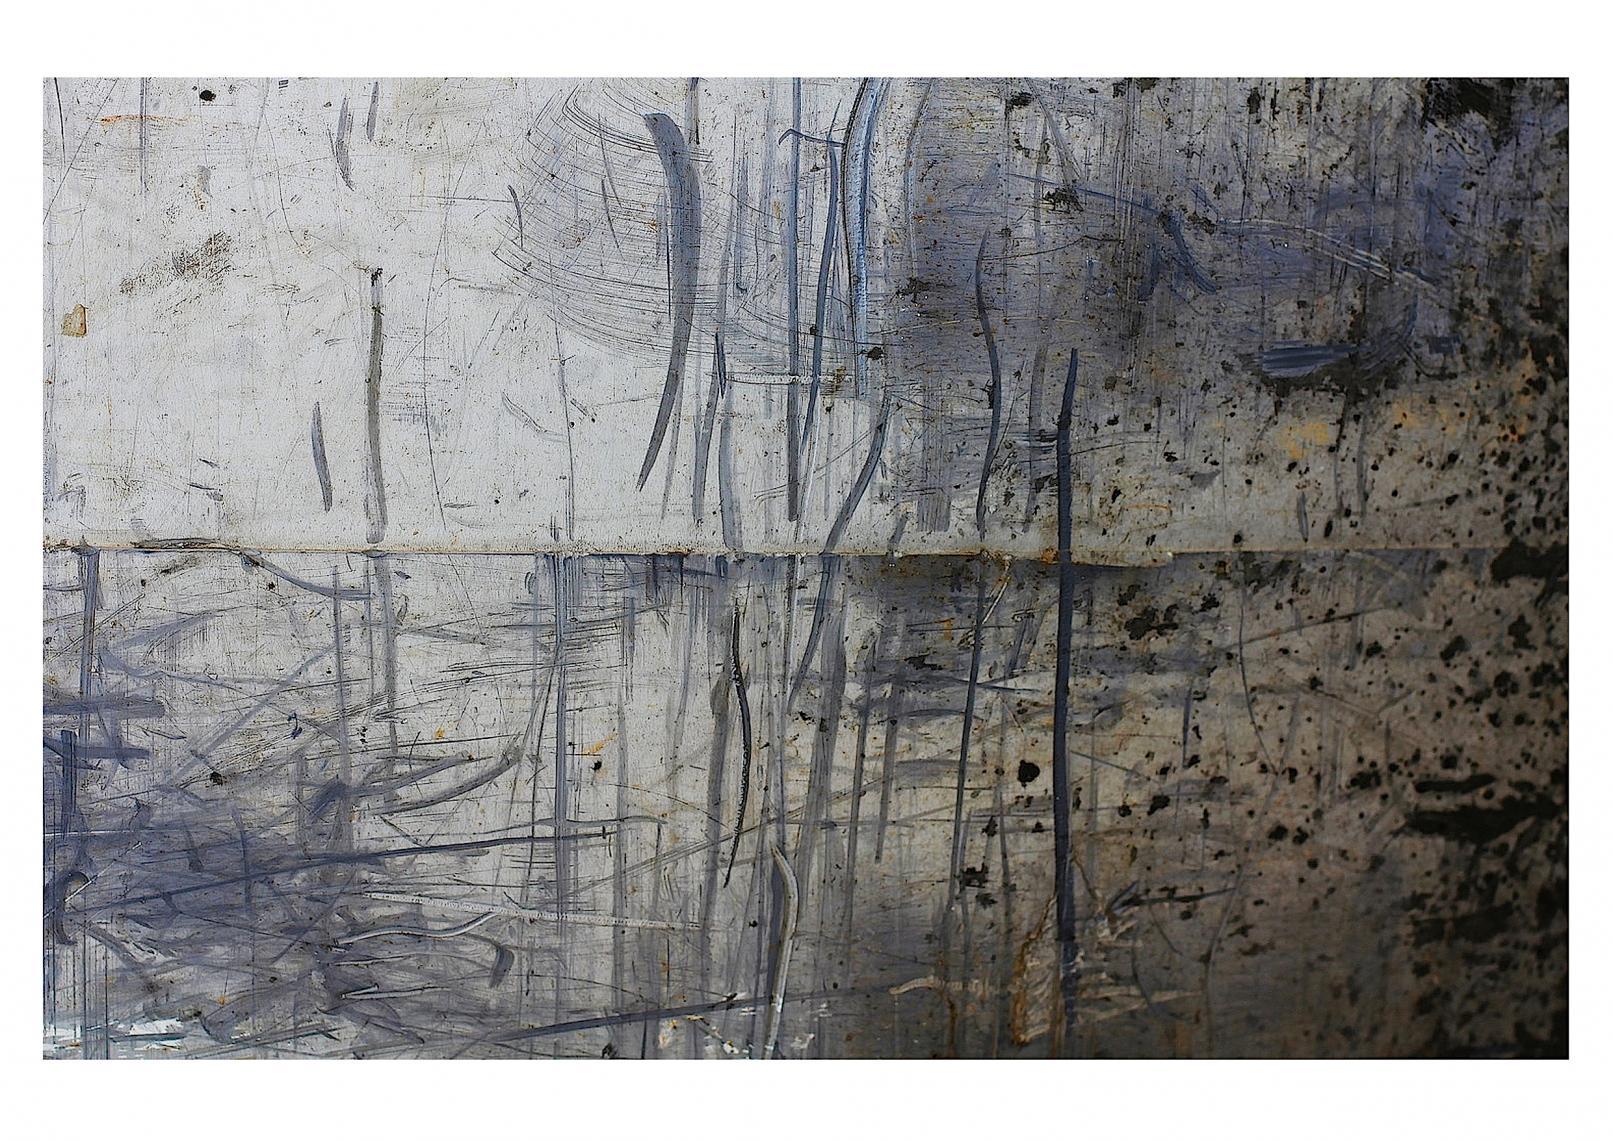 Vedado-Havana (Trash Painting V) (2017) - David Beltrán